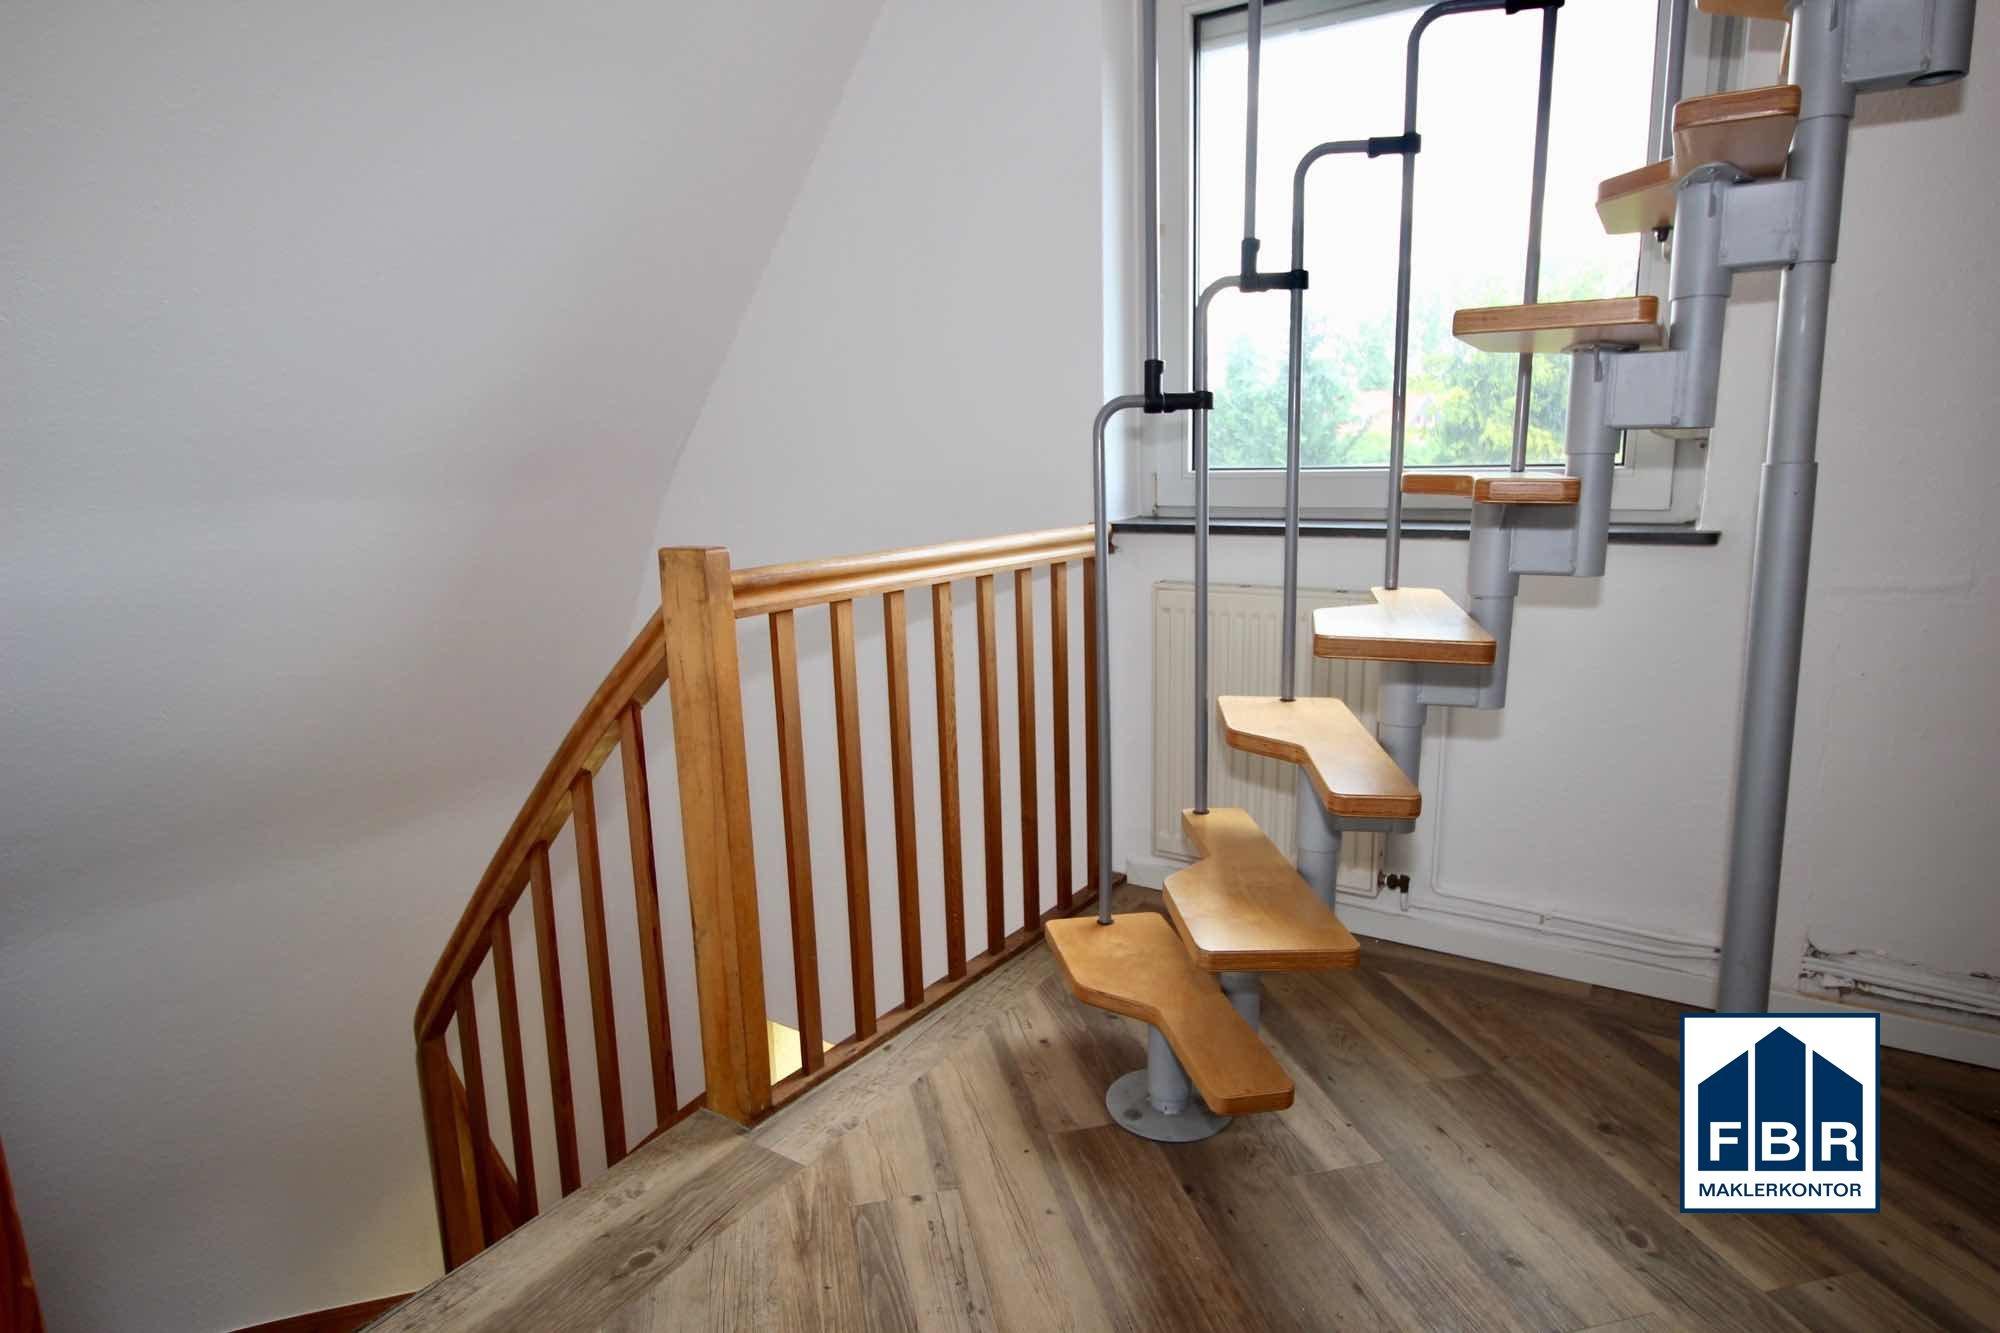 Treppenhaus im Obergeschoss mit Treppe zum Dachboden